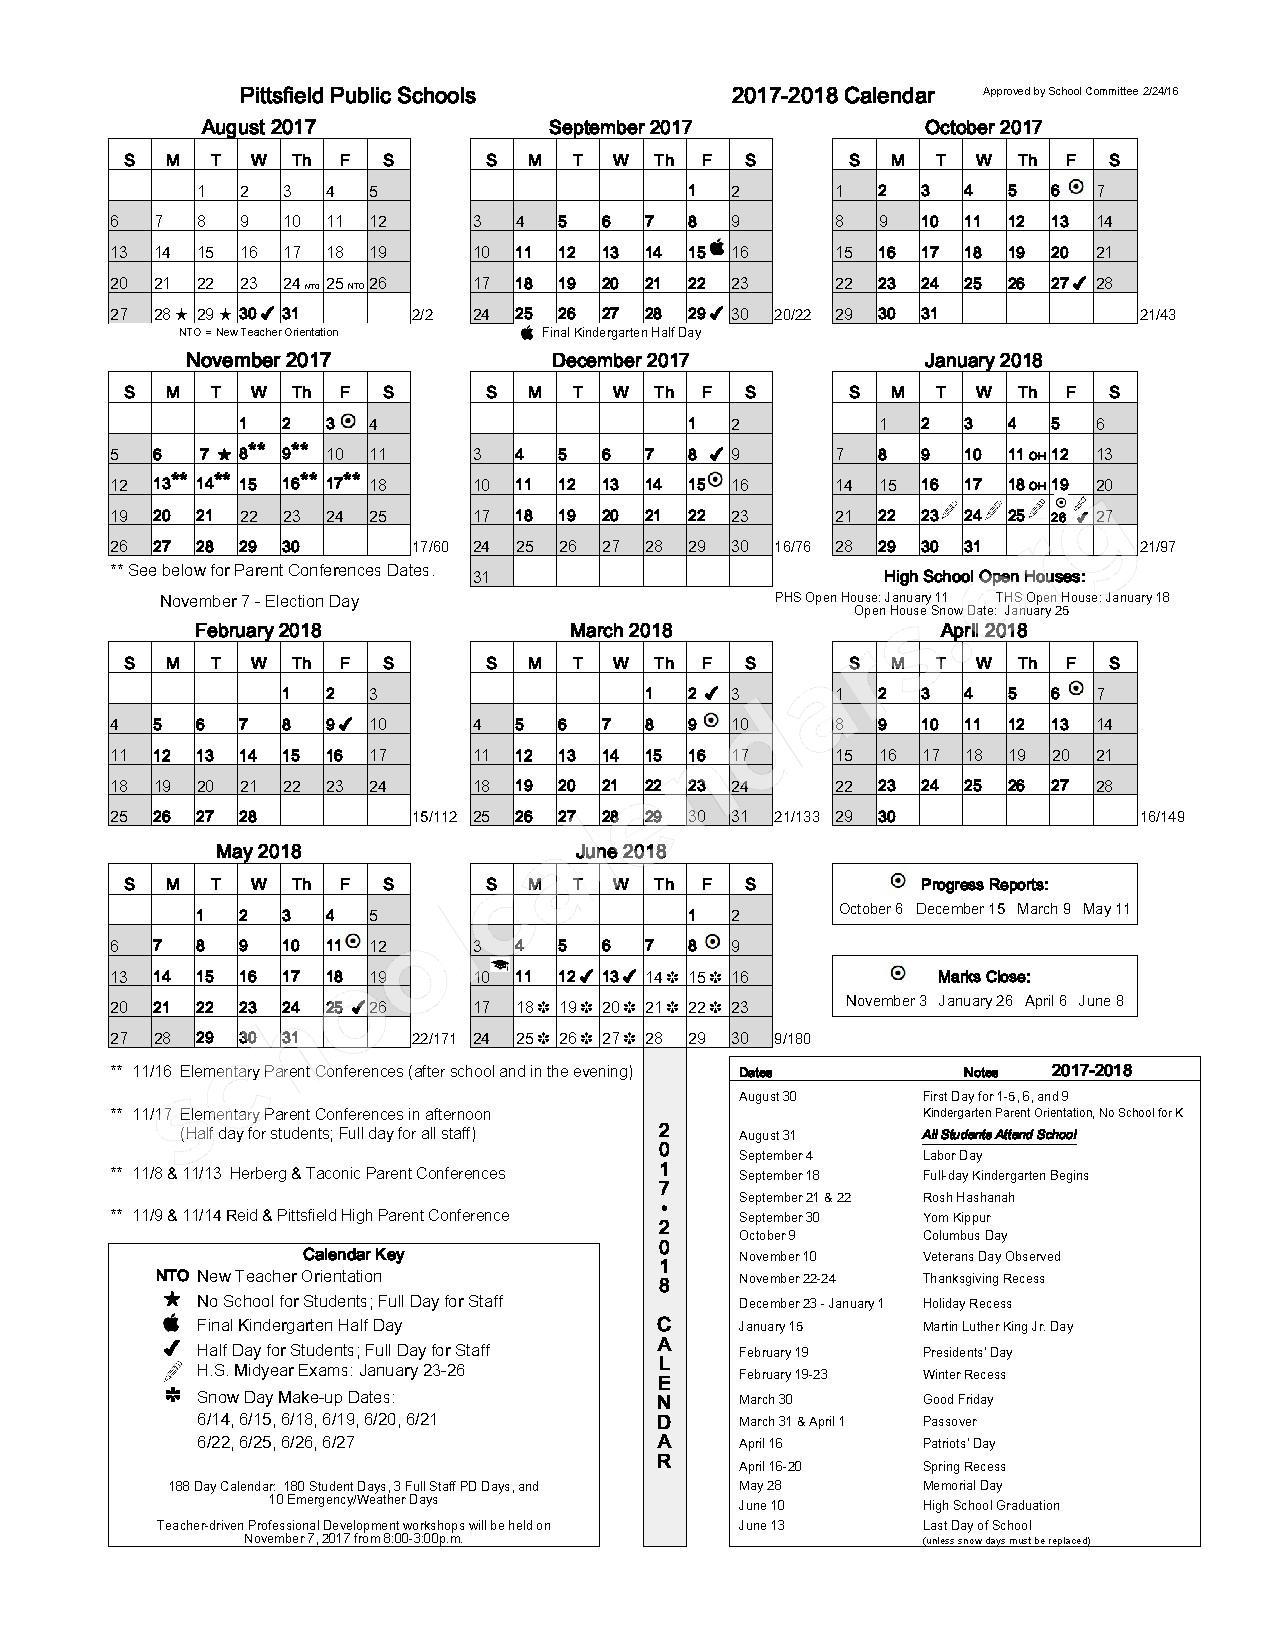 2017 - 2018 Calendar – Pittsfield Public Schools – page 1